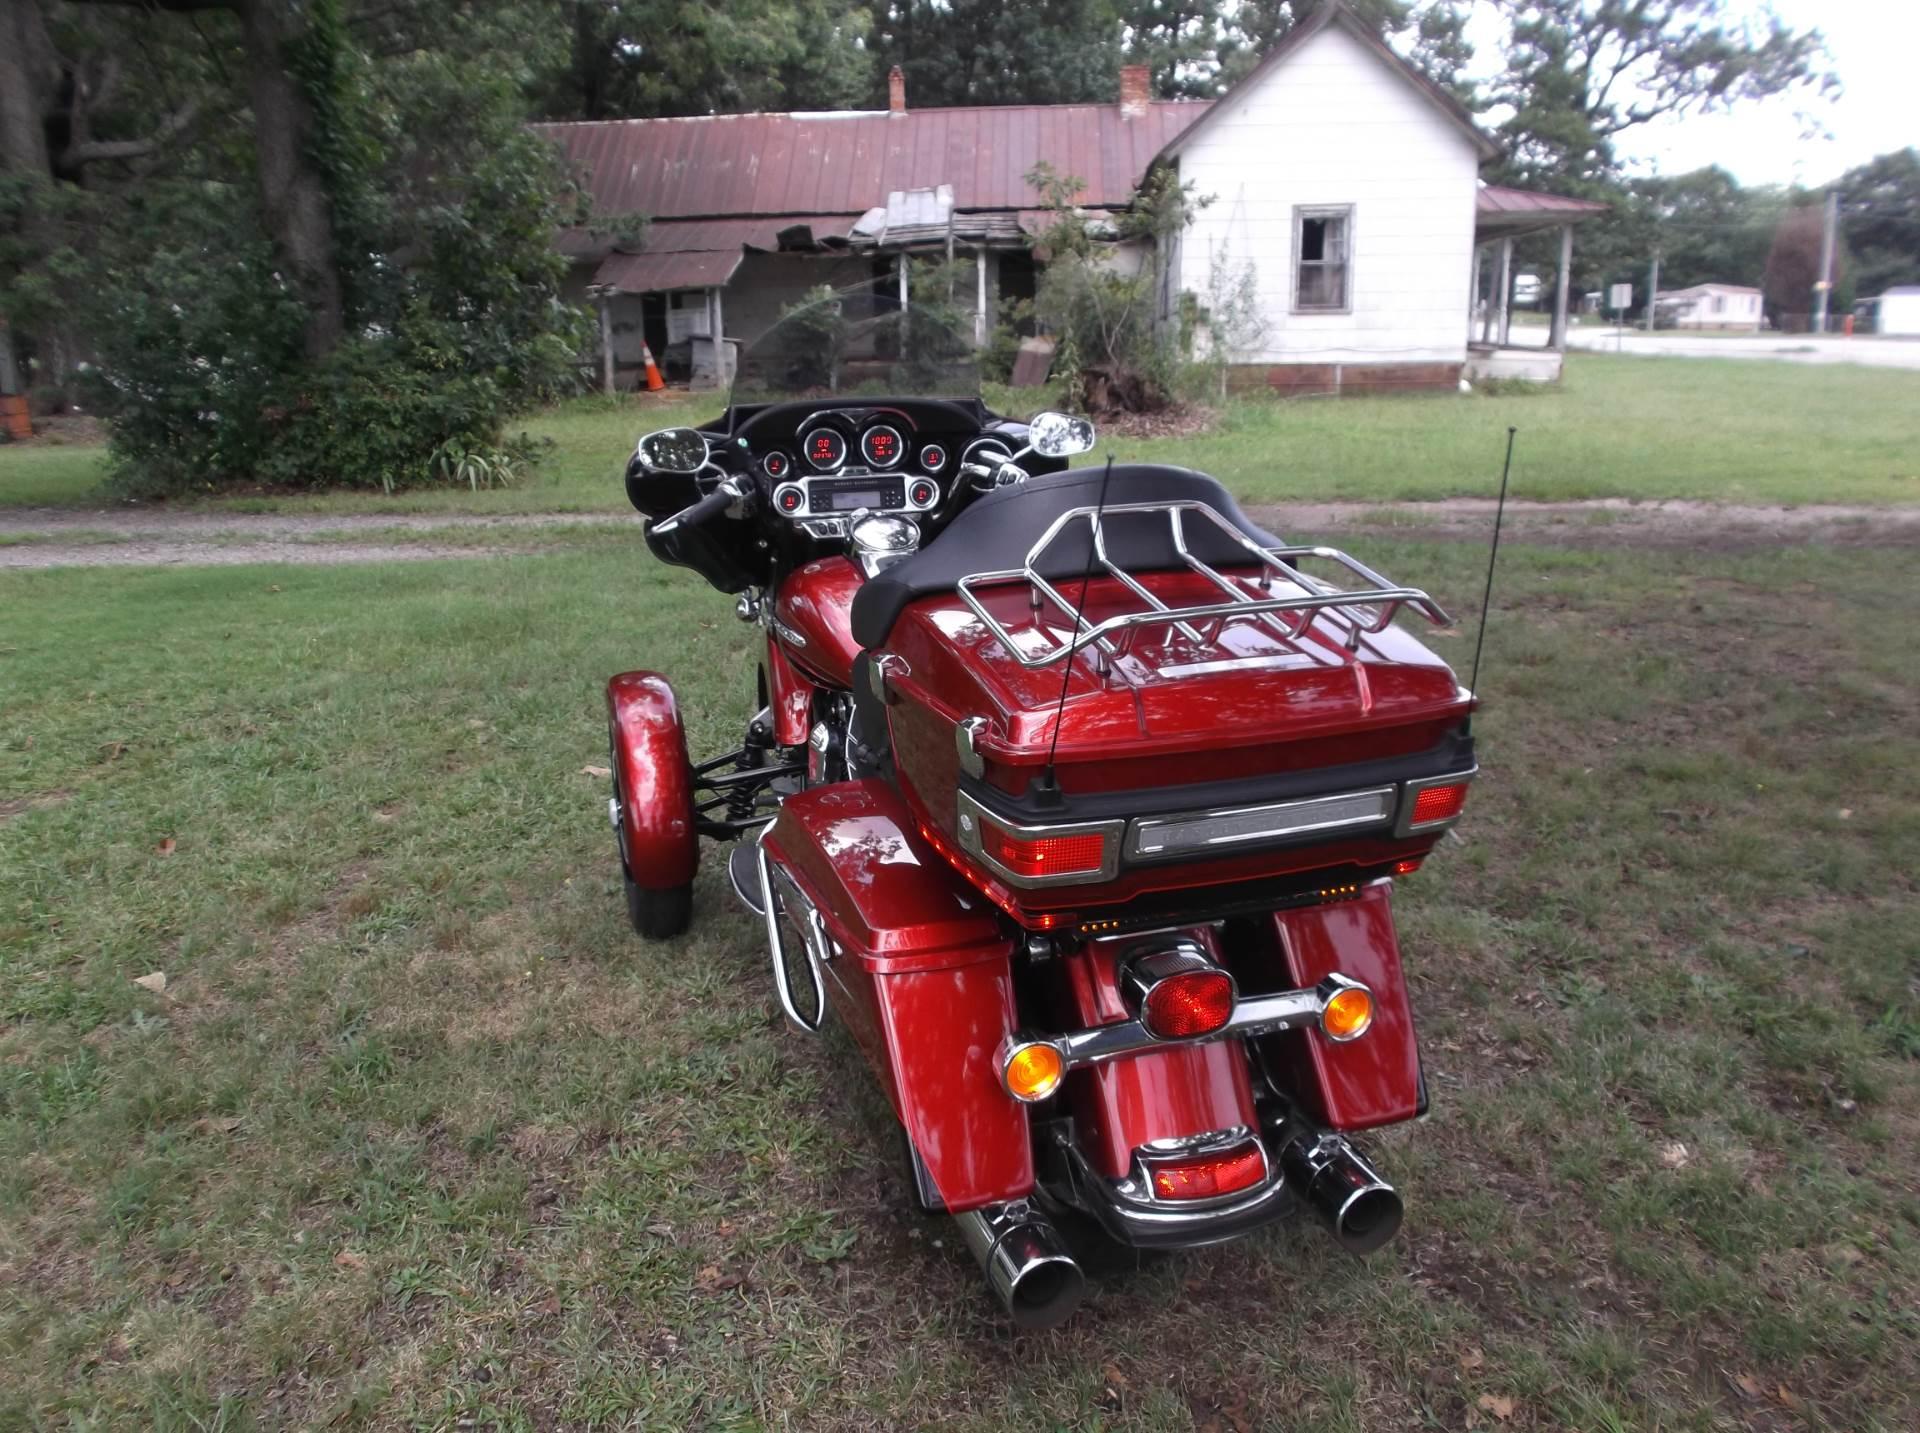 2012 Harley Davidson Tilting Motor Works Trike Red In Greer South Carolina